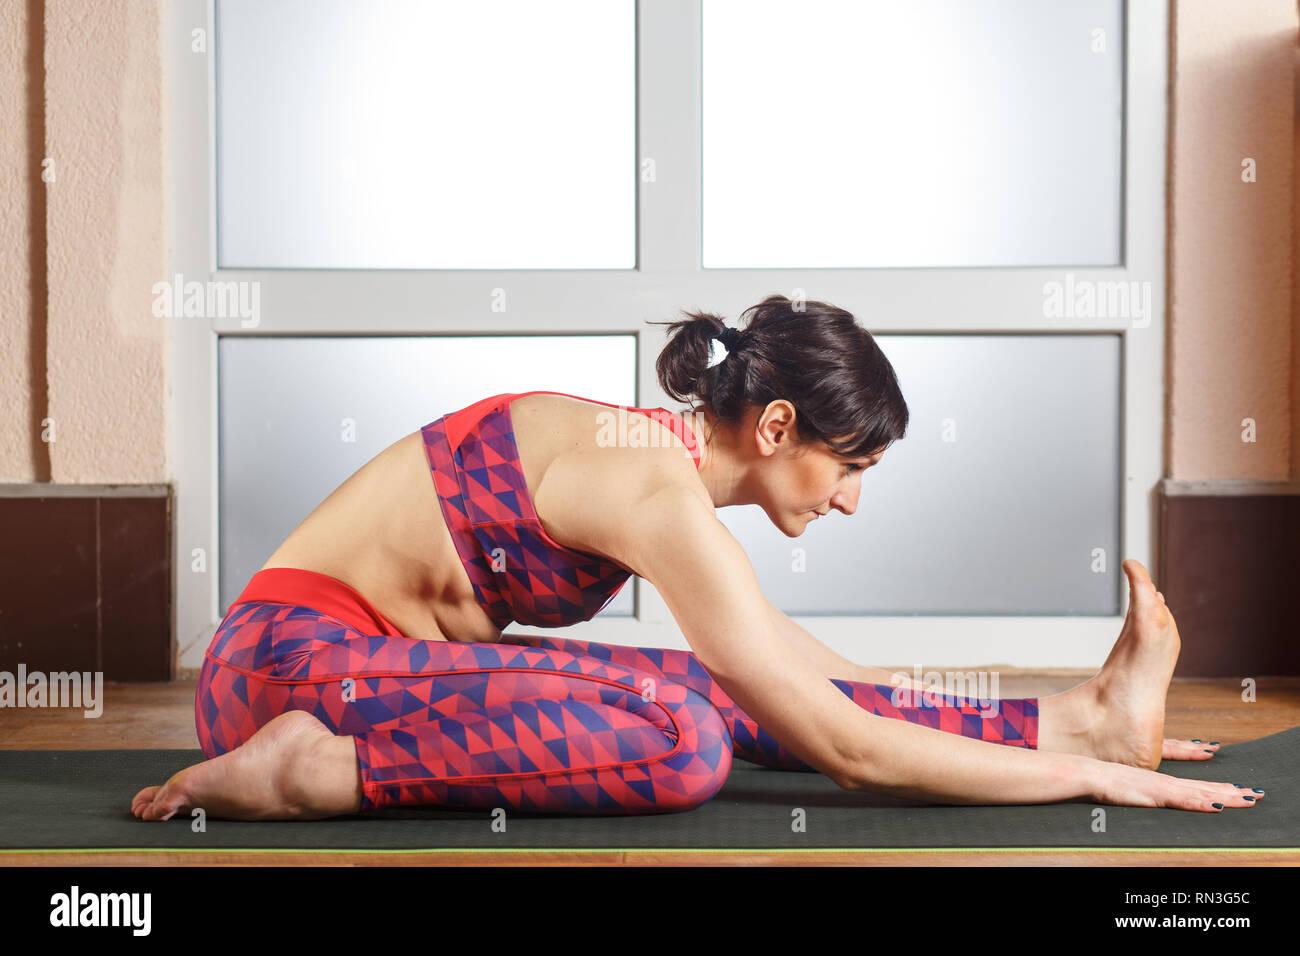 Young sporty woman practicing yoga, doing doing Ashtanga Vinyasa yoga Tiryam-Mukha Eka-Pada Paschimottanasana asana stretching position in a fitnes cl - Stock Image